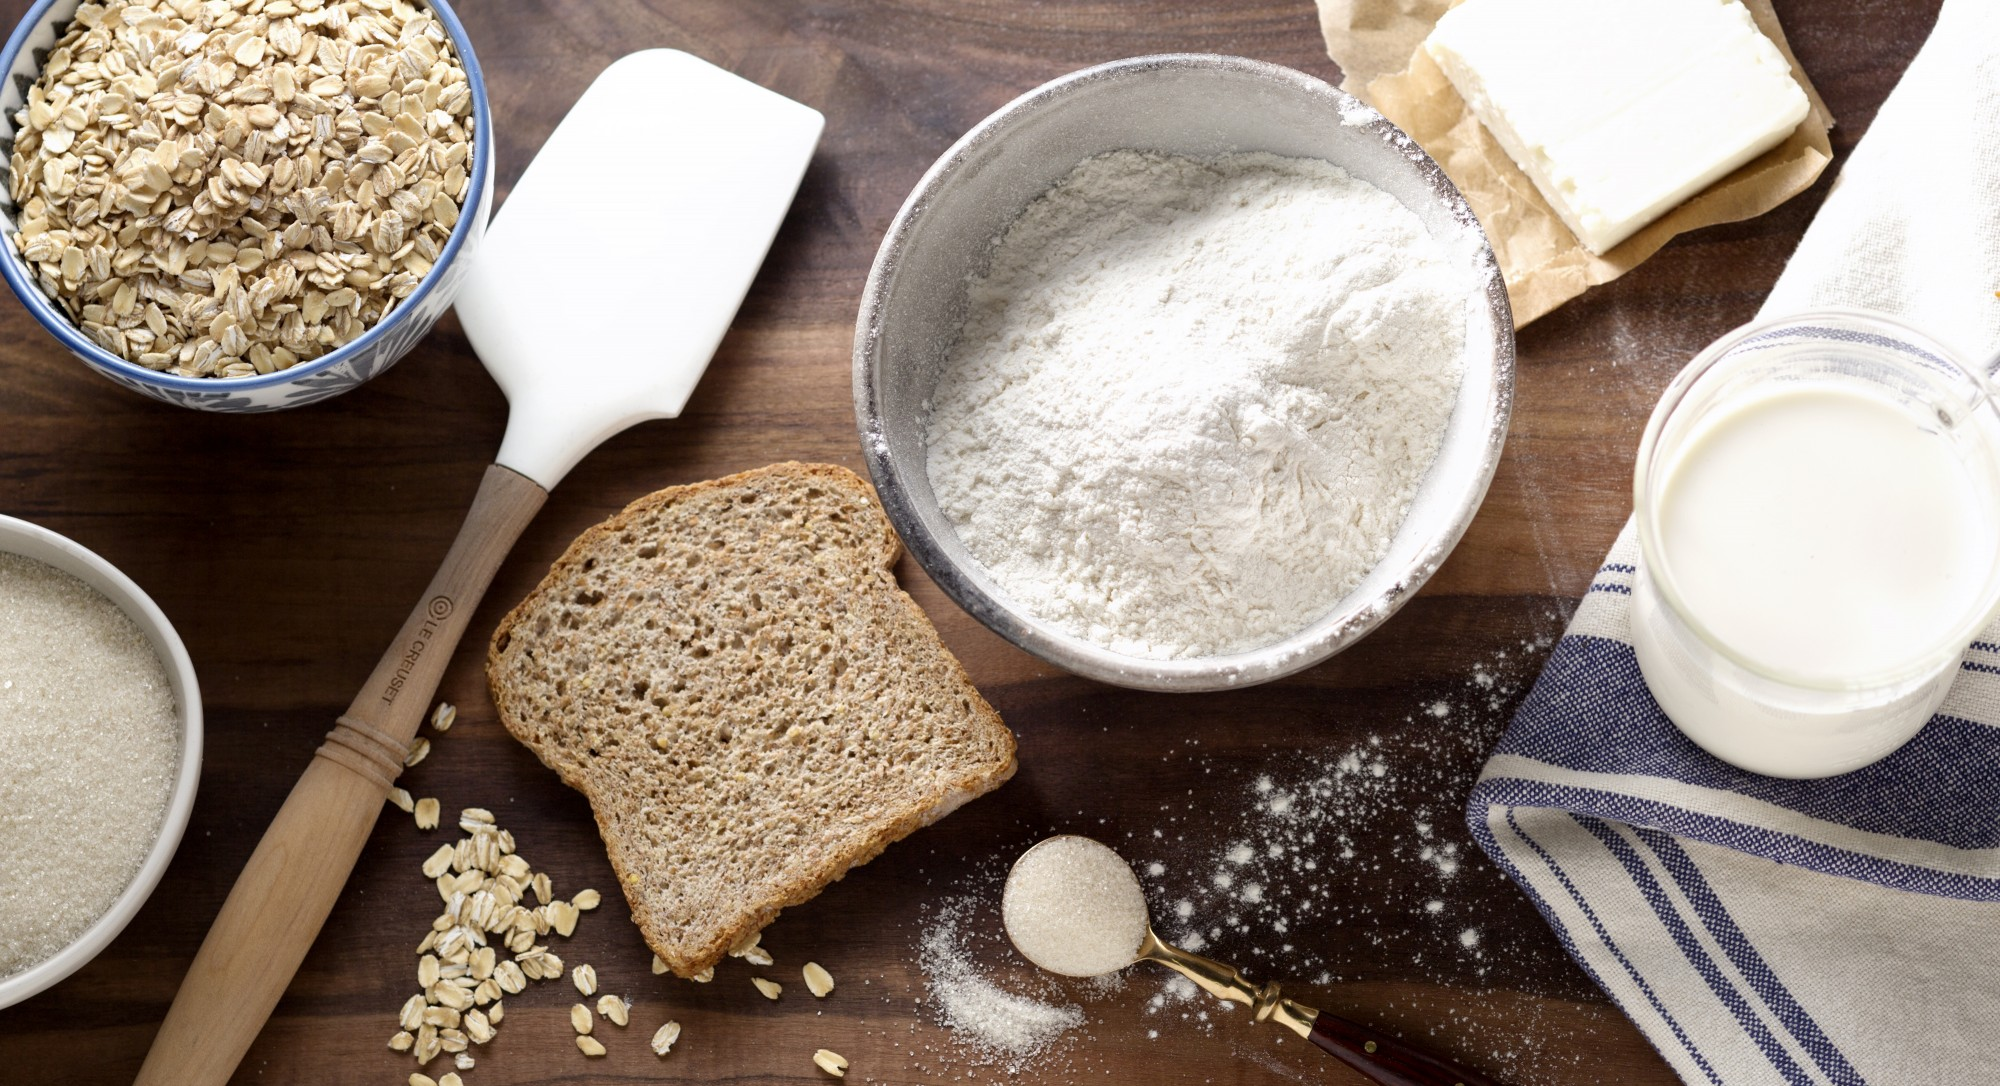 Fermentation Frenzy: 4 DIY Kits to Make Everything from Yogurt to Sourdough